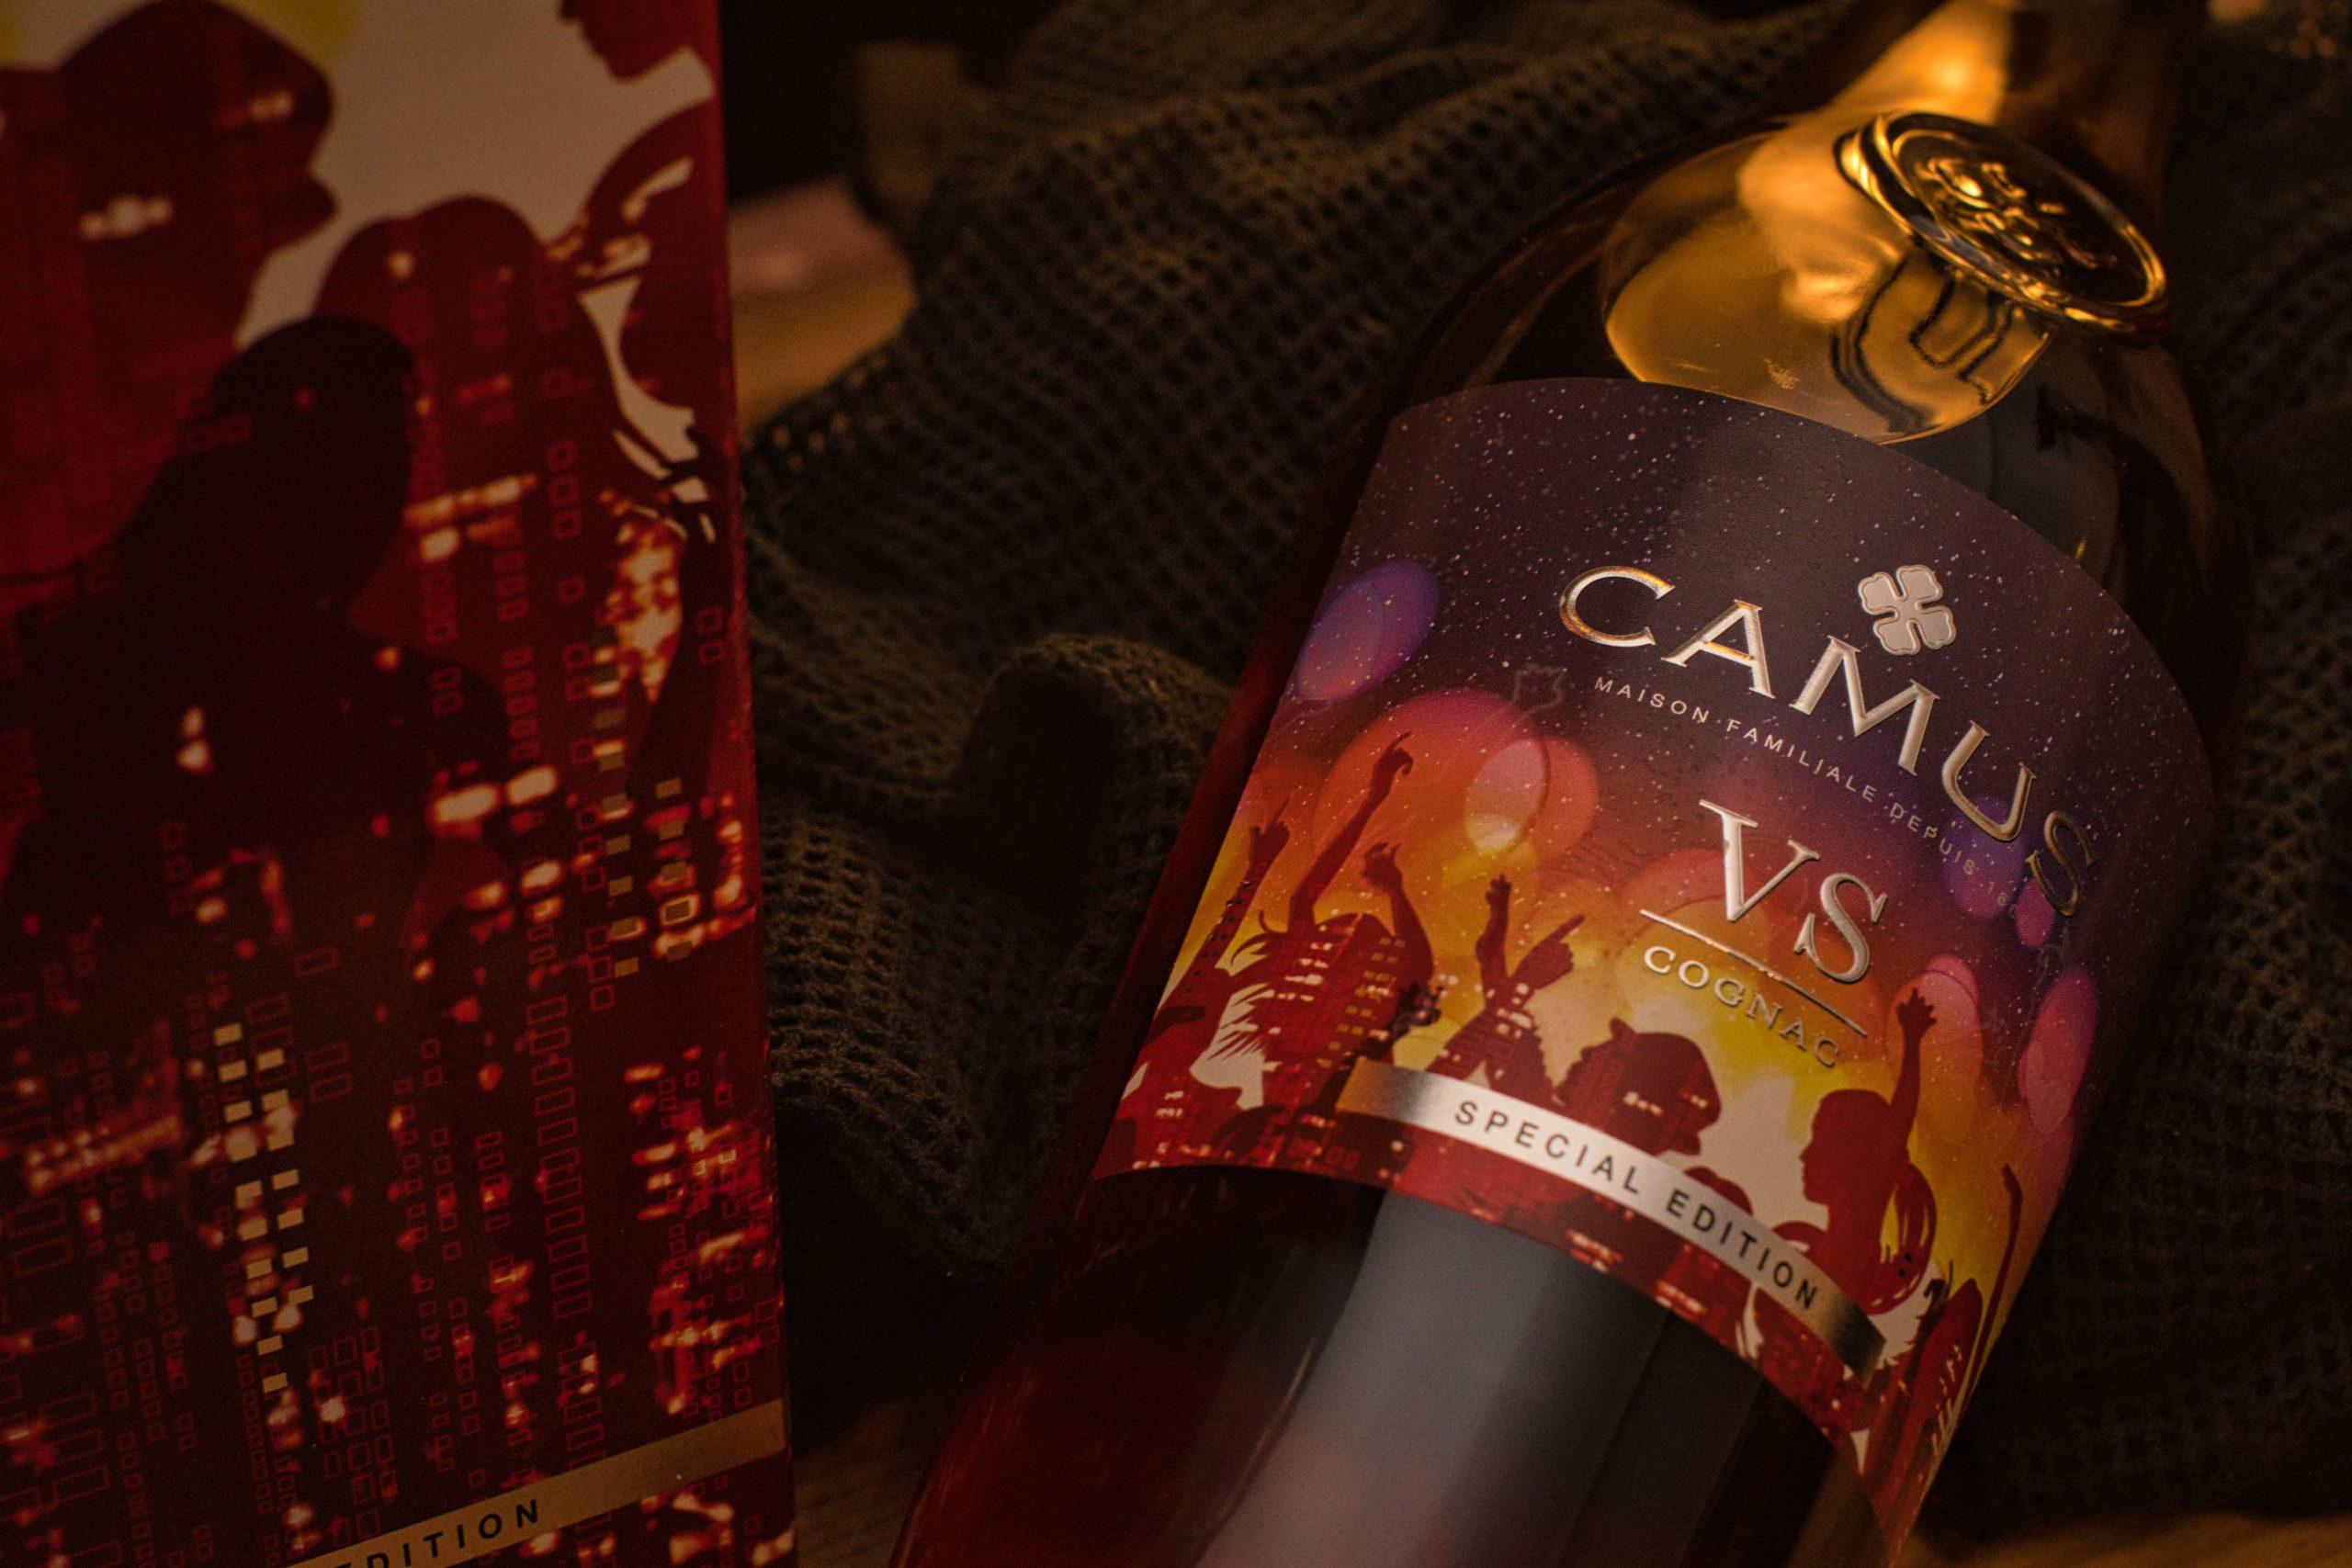 Last Minute Geschenkideen Weihnachten - Cognac Camus Special Edition